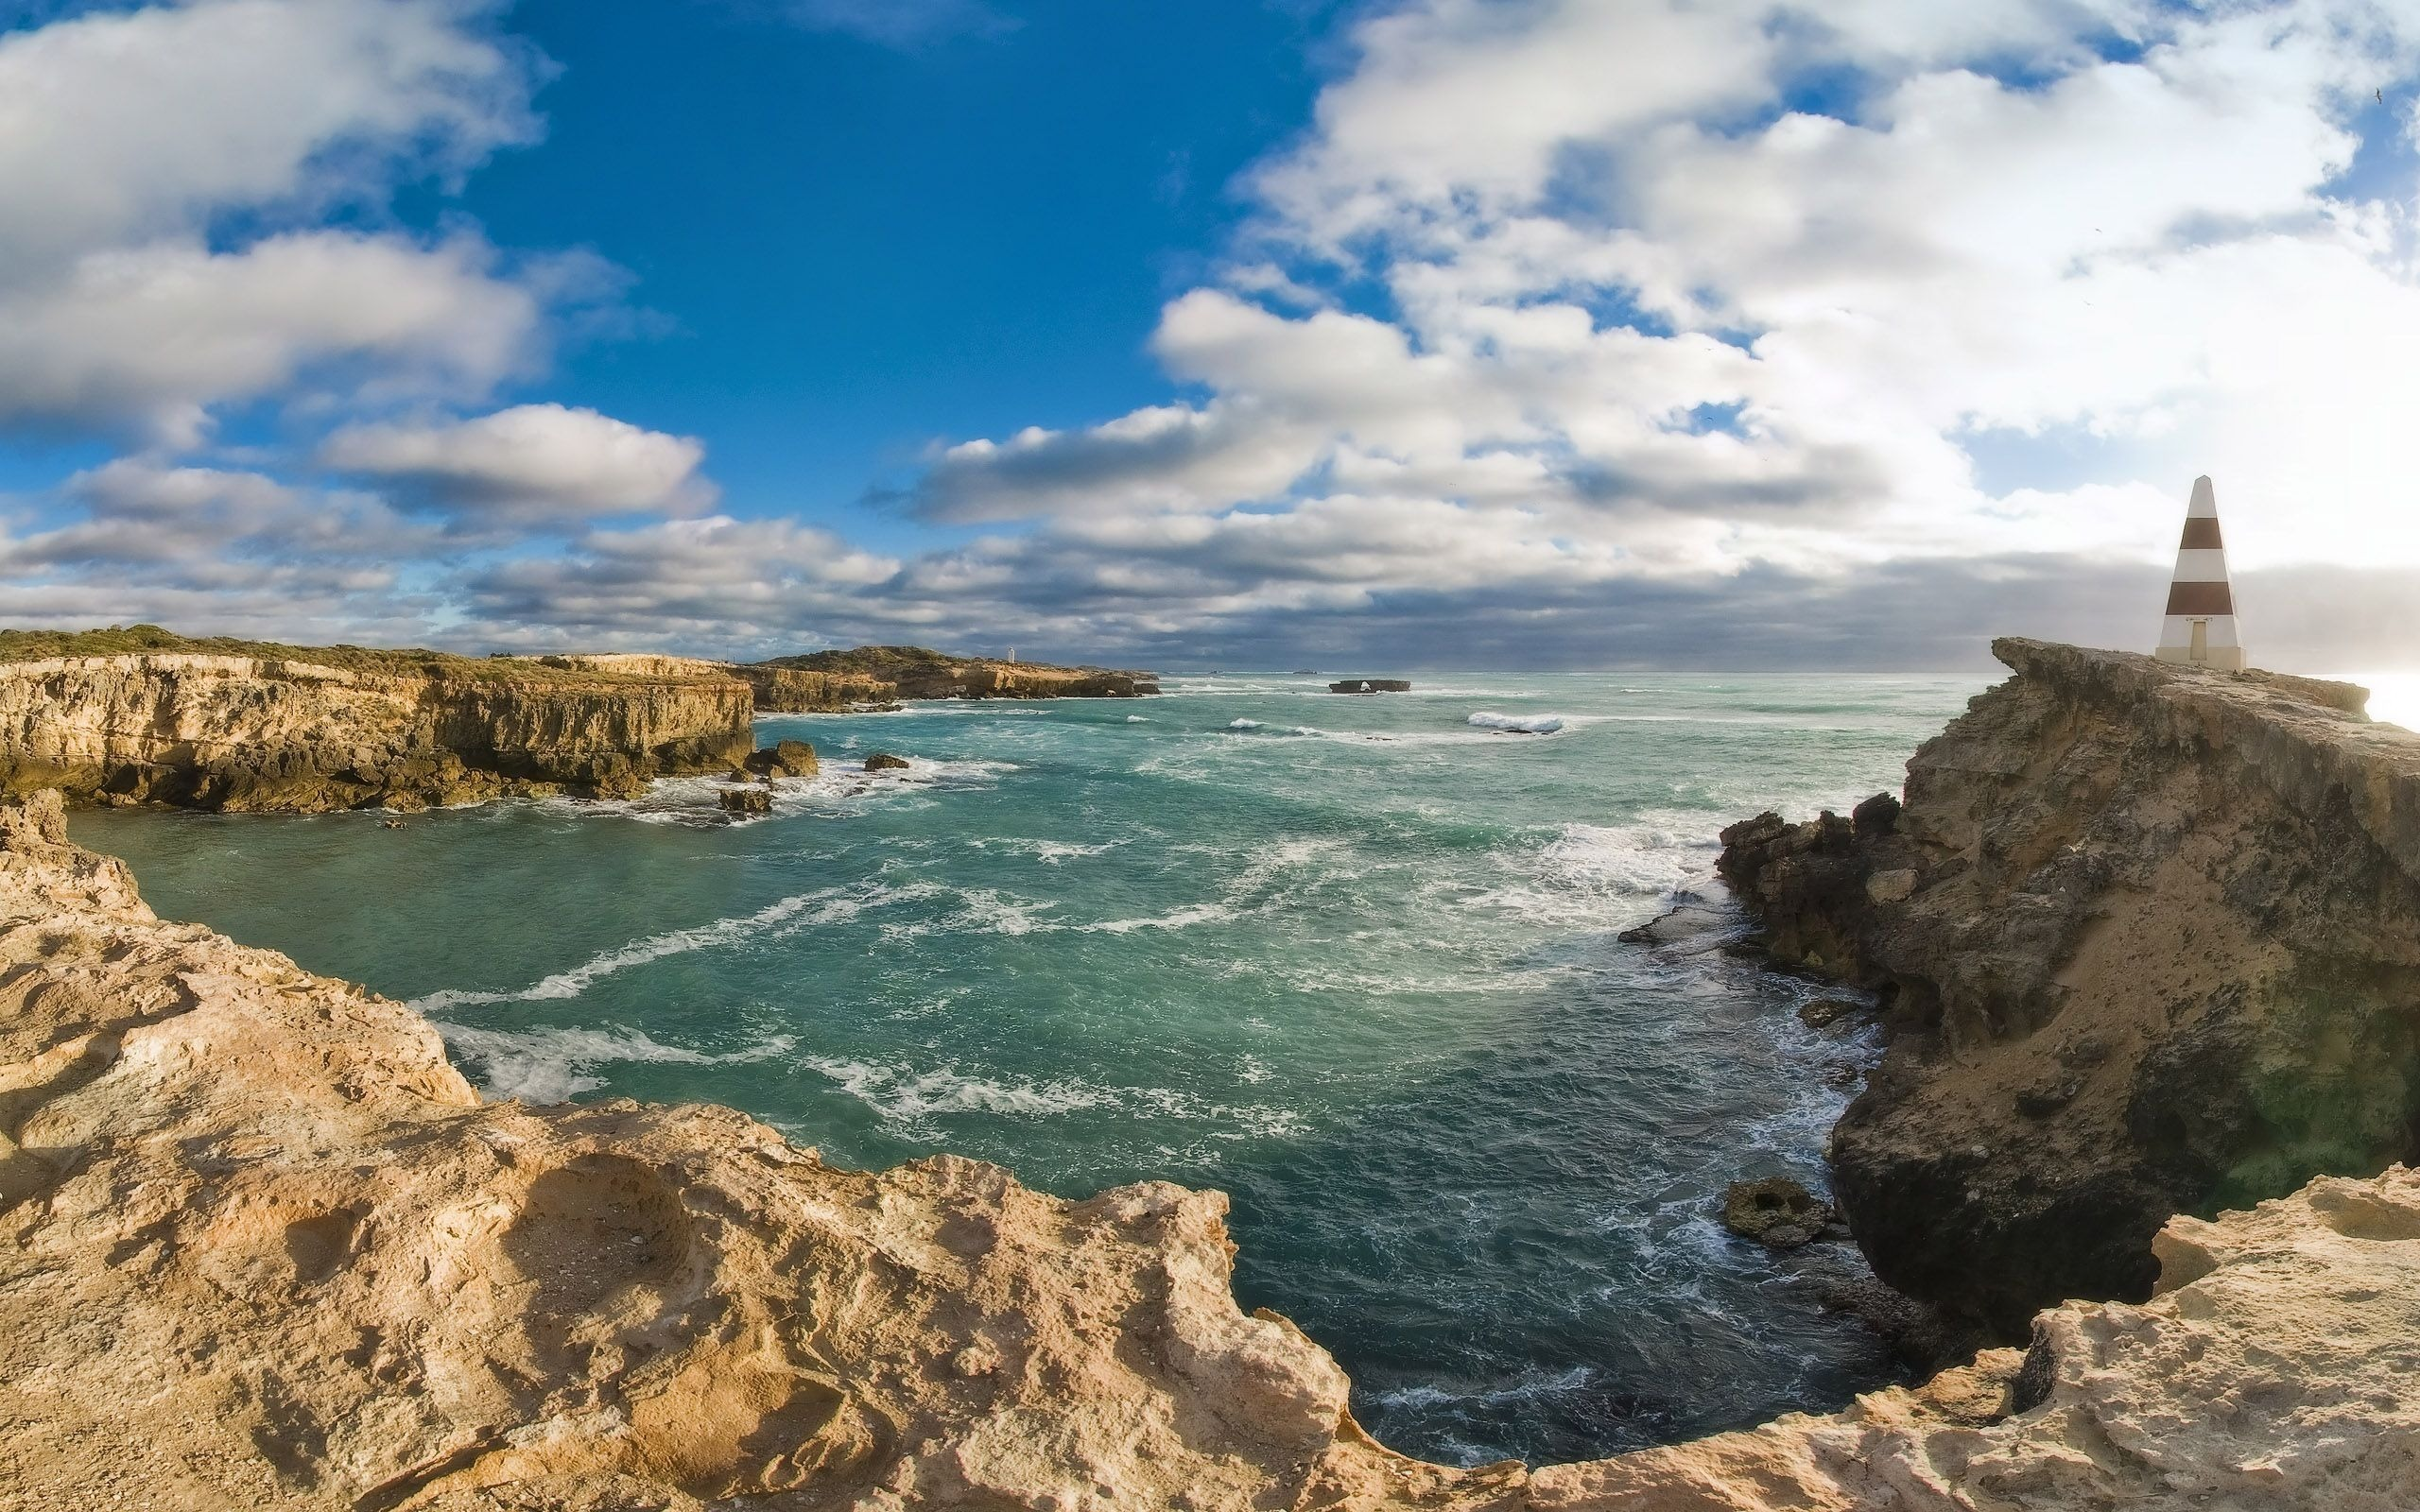 природа маяк море скалы  № 2238475 без смс